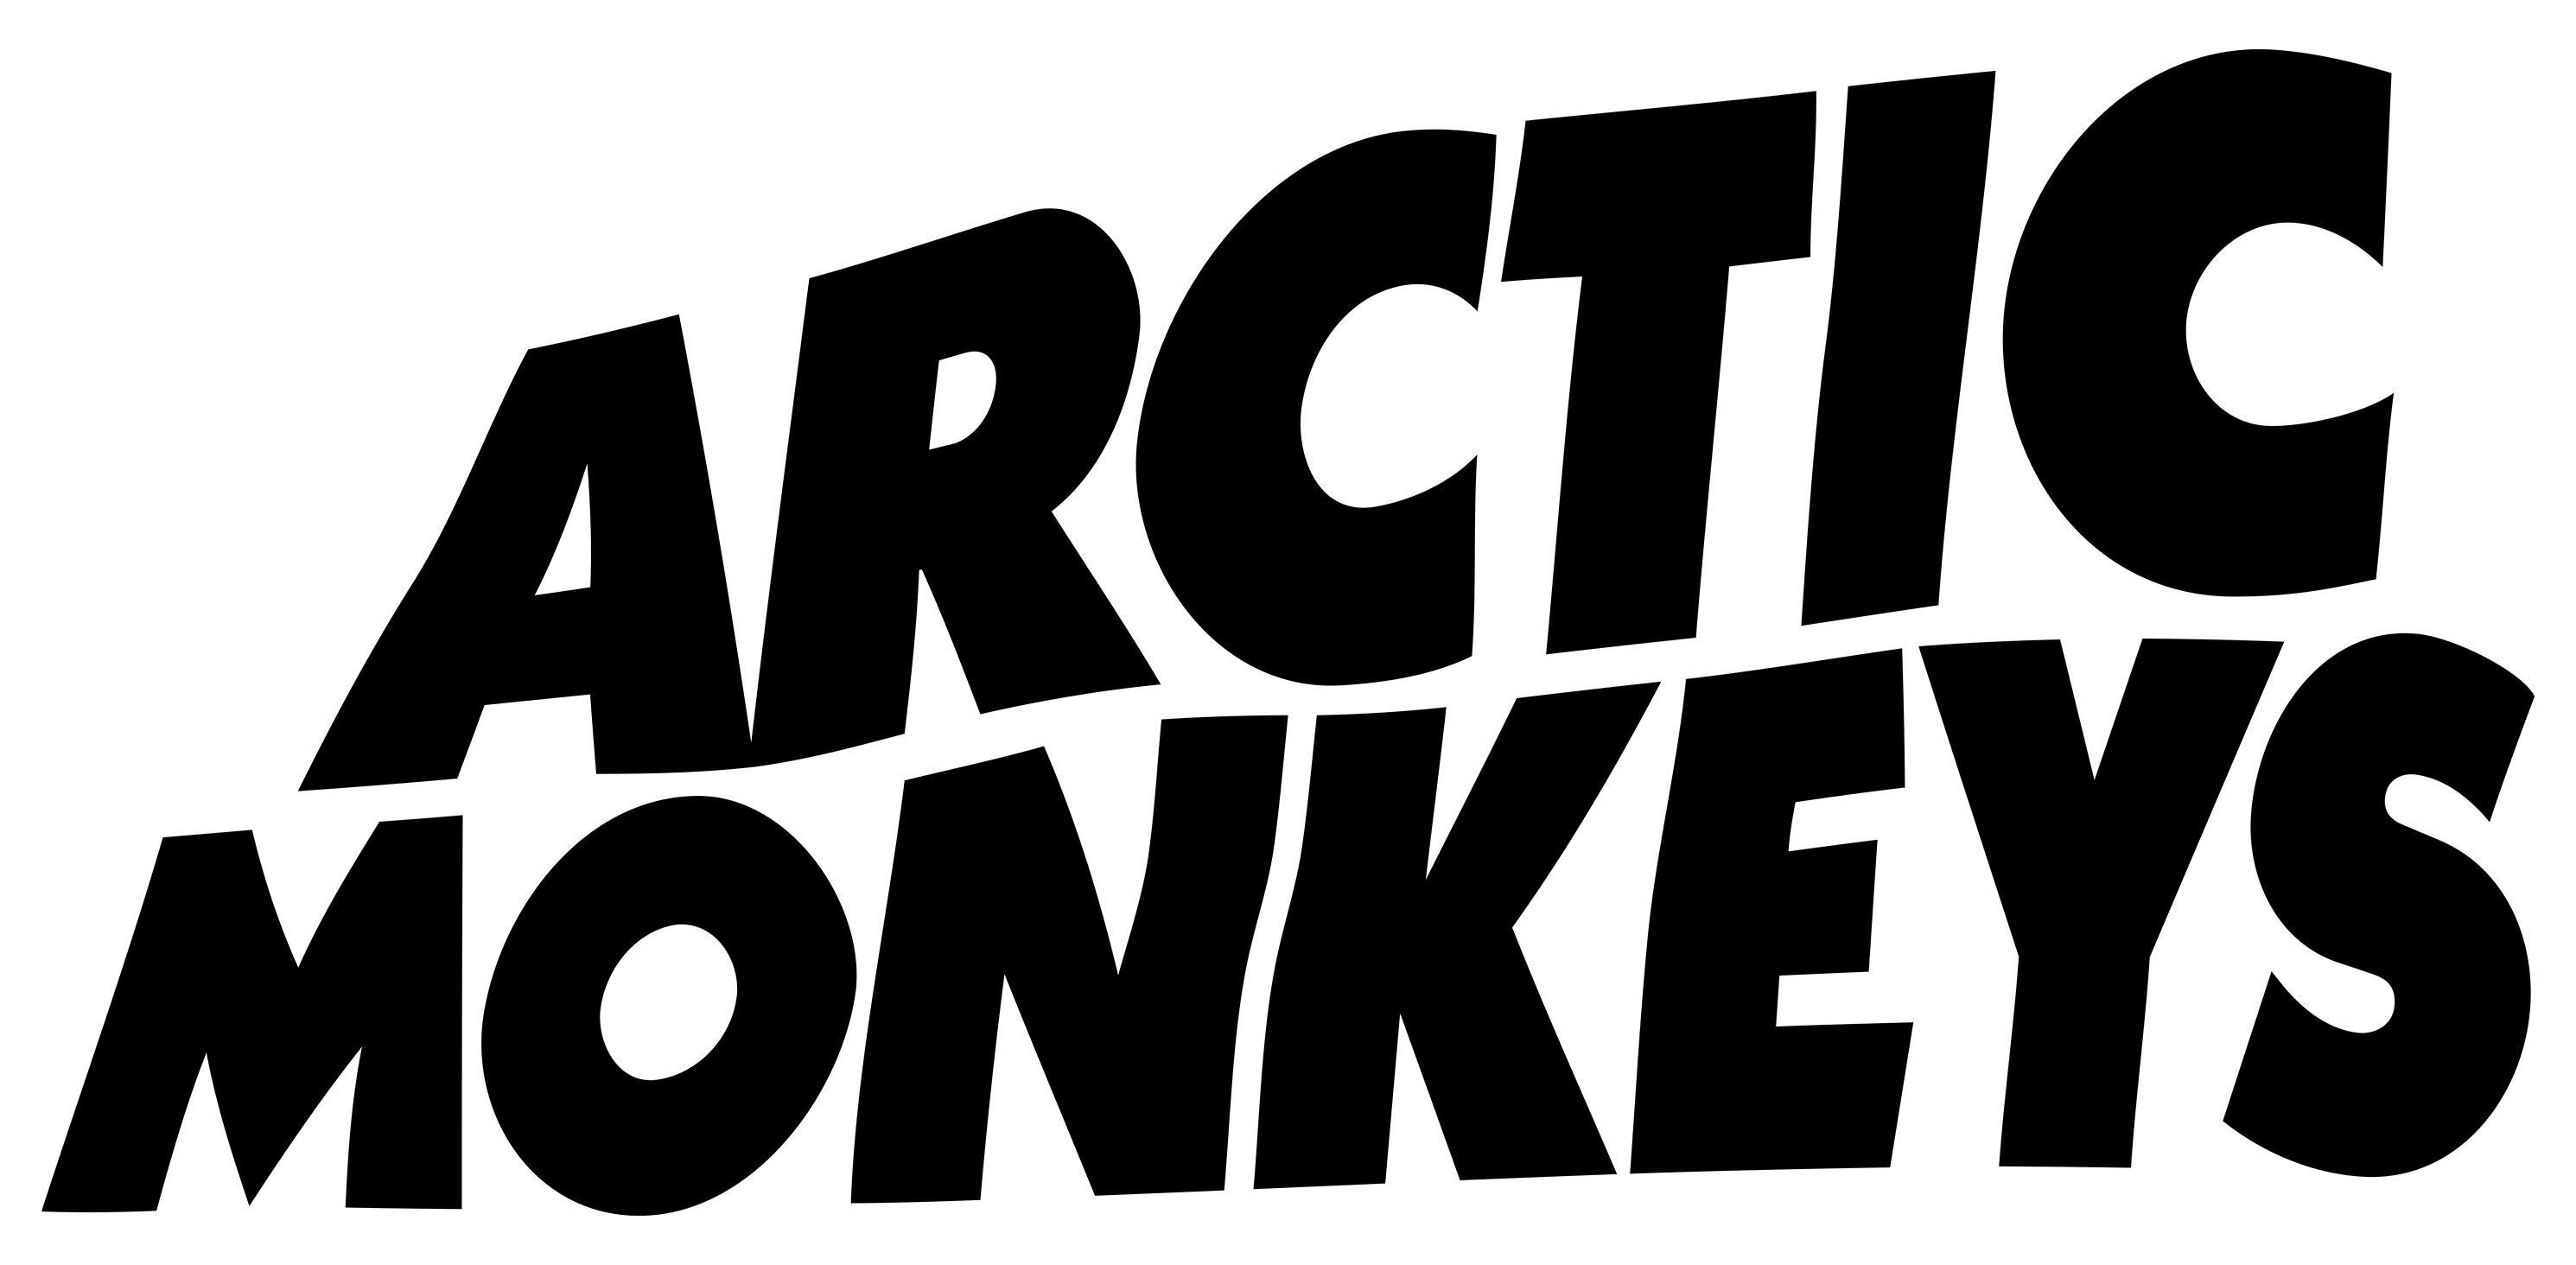 Logo Arctic Monkeys Png - Arctic Monkeys Wallpapers Background Arctic Monkeys Logo Wallpaper Pluspng Pluspng.com   Arctic Monkeys Vector Png, Transparent background PNG HD thumbnail